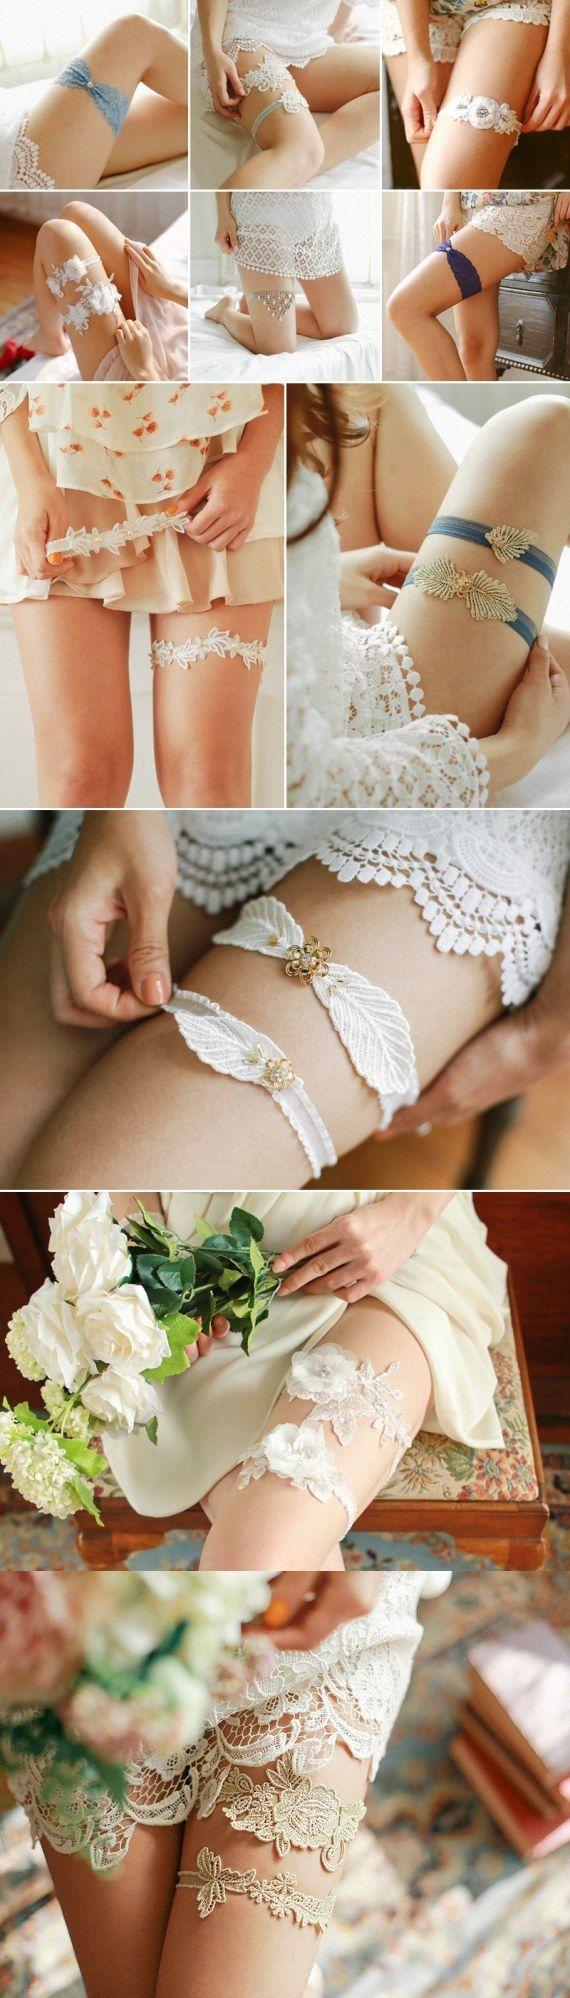 lace wedding garter set via louloudimeli / http://www.deerpearlflowers.com/wedding-garters-sets-from-etsy/